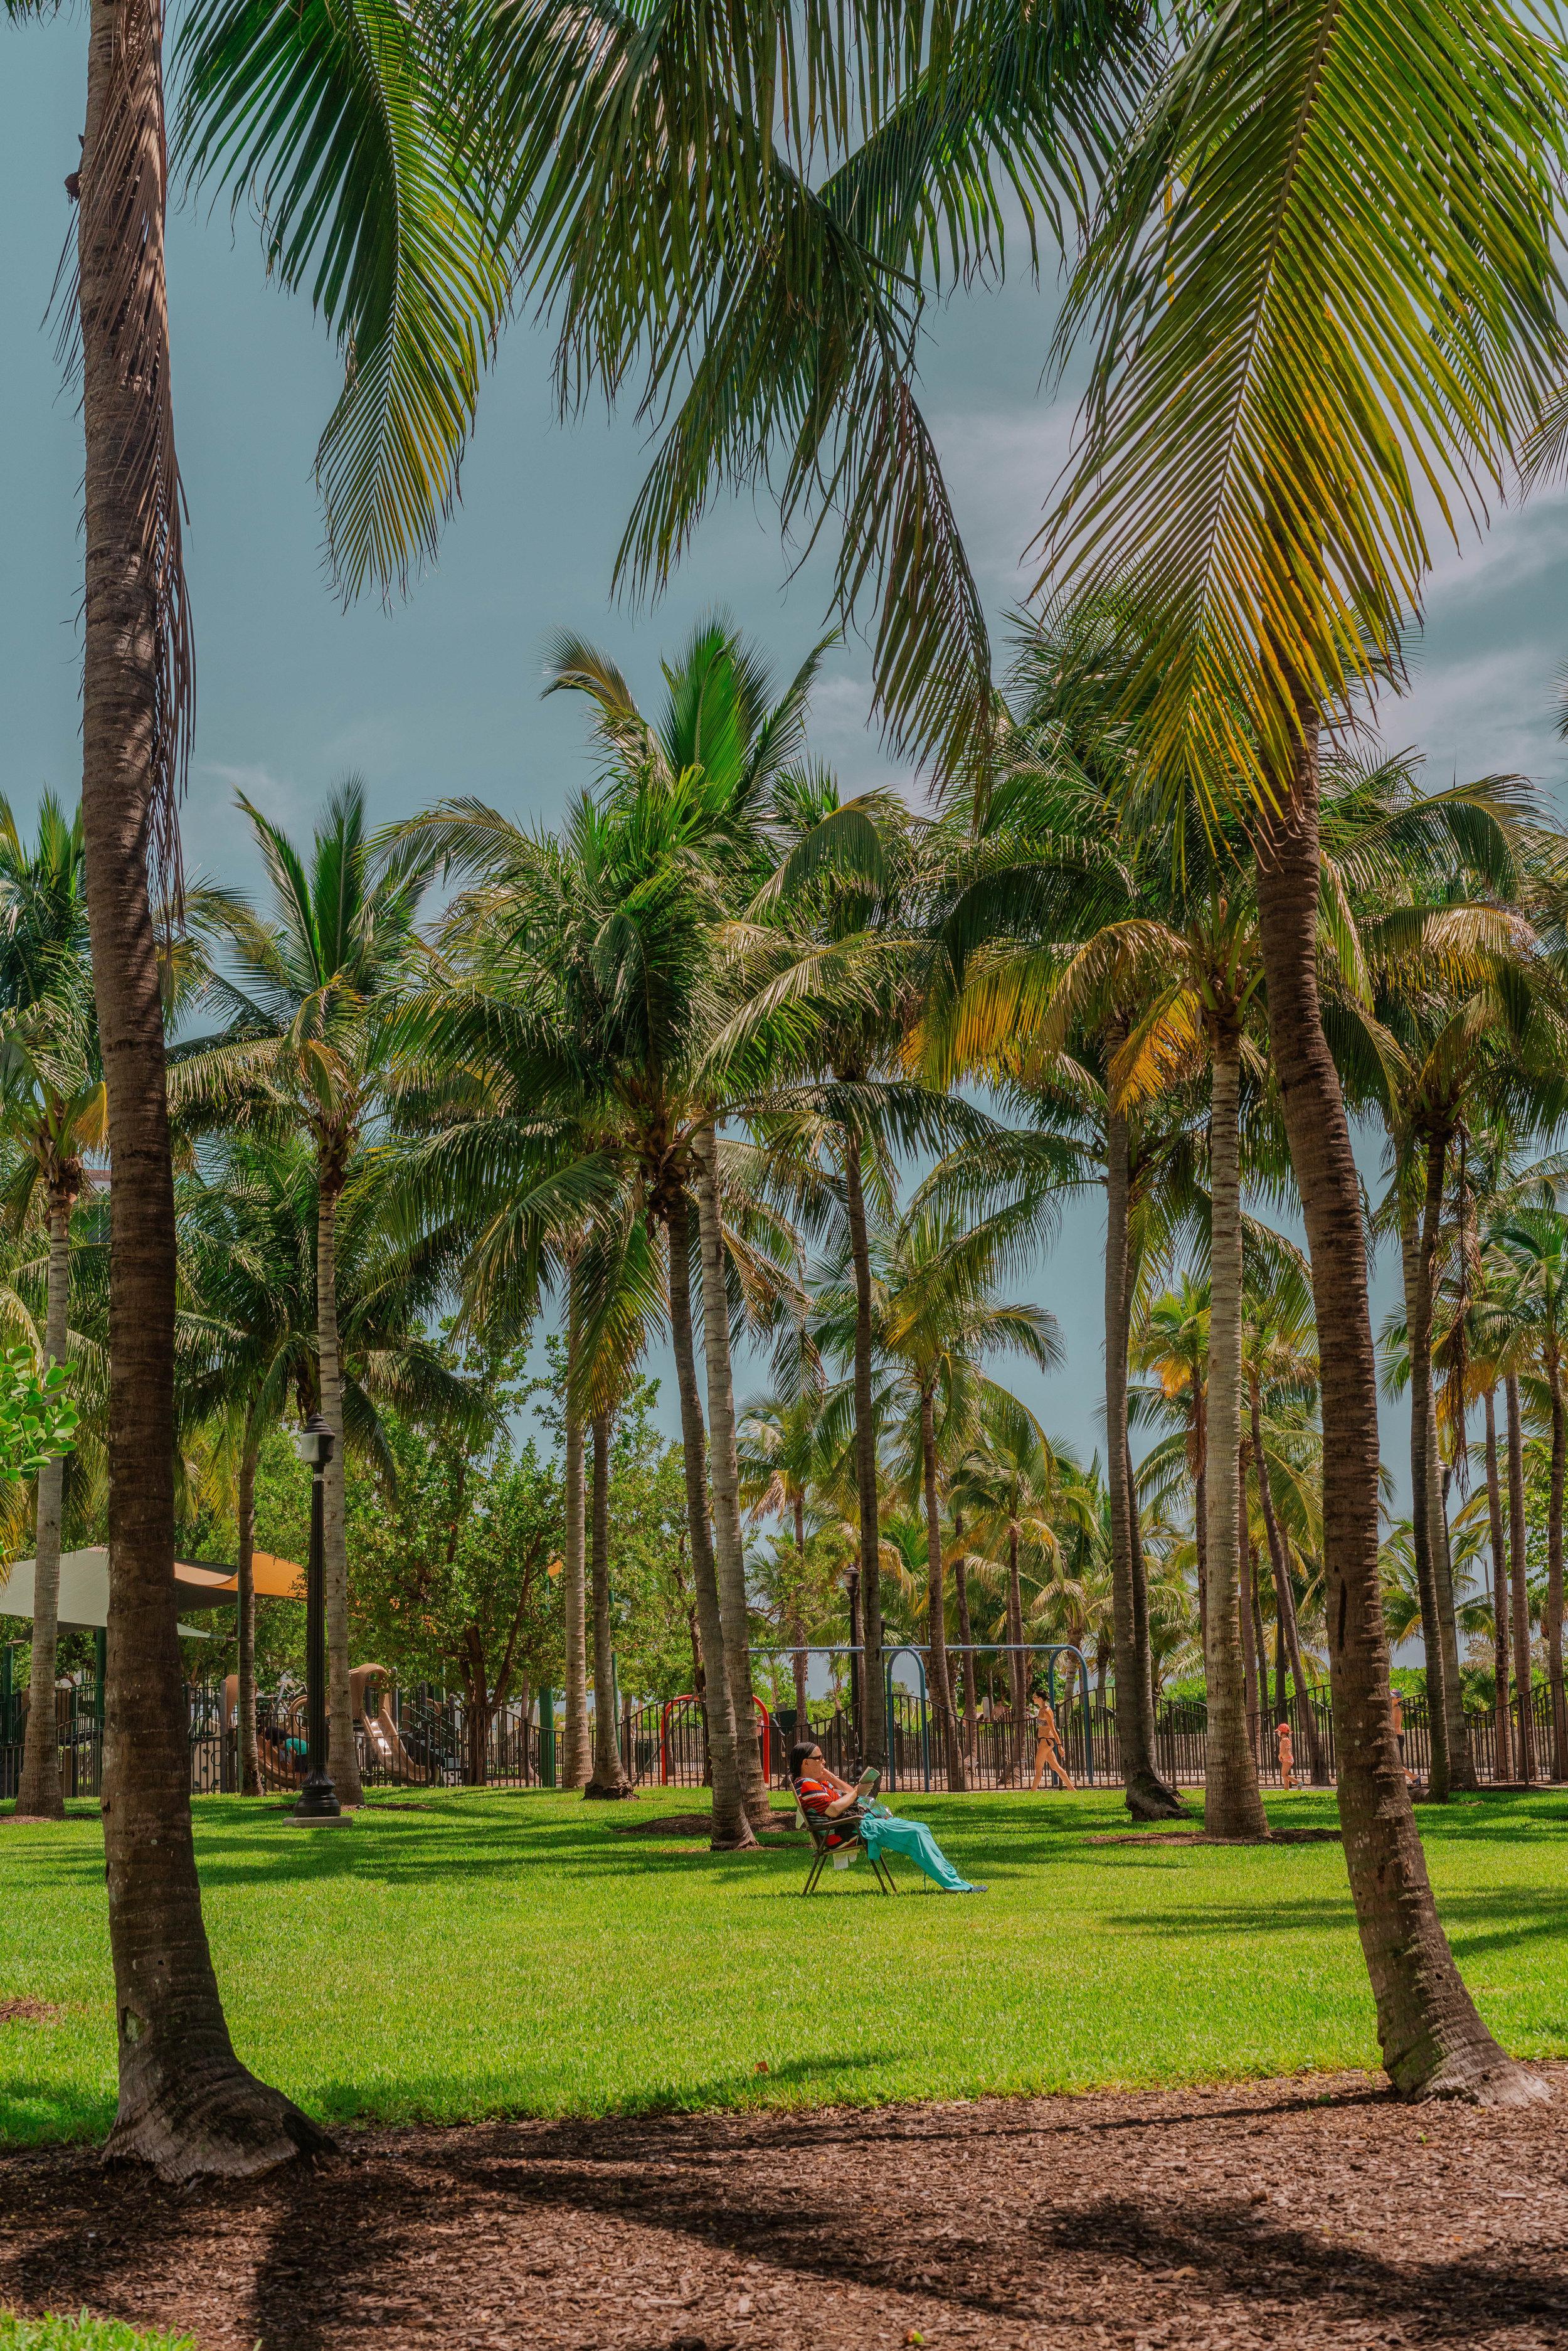 CynLagos-MiamiBeach-Aug-2019-1.jpg